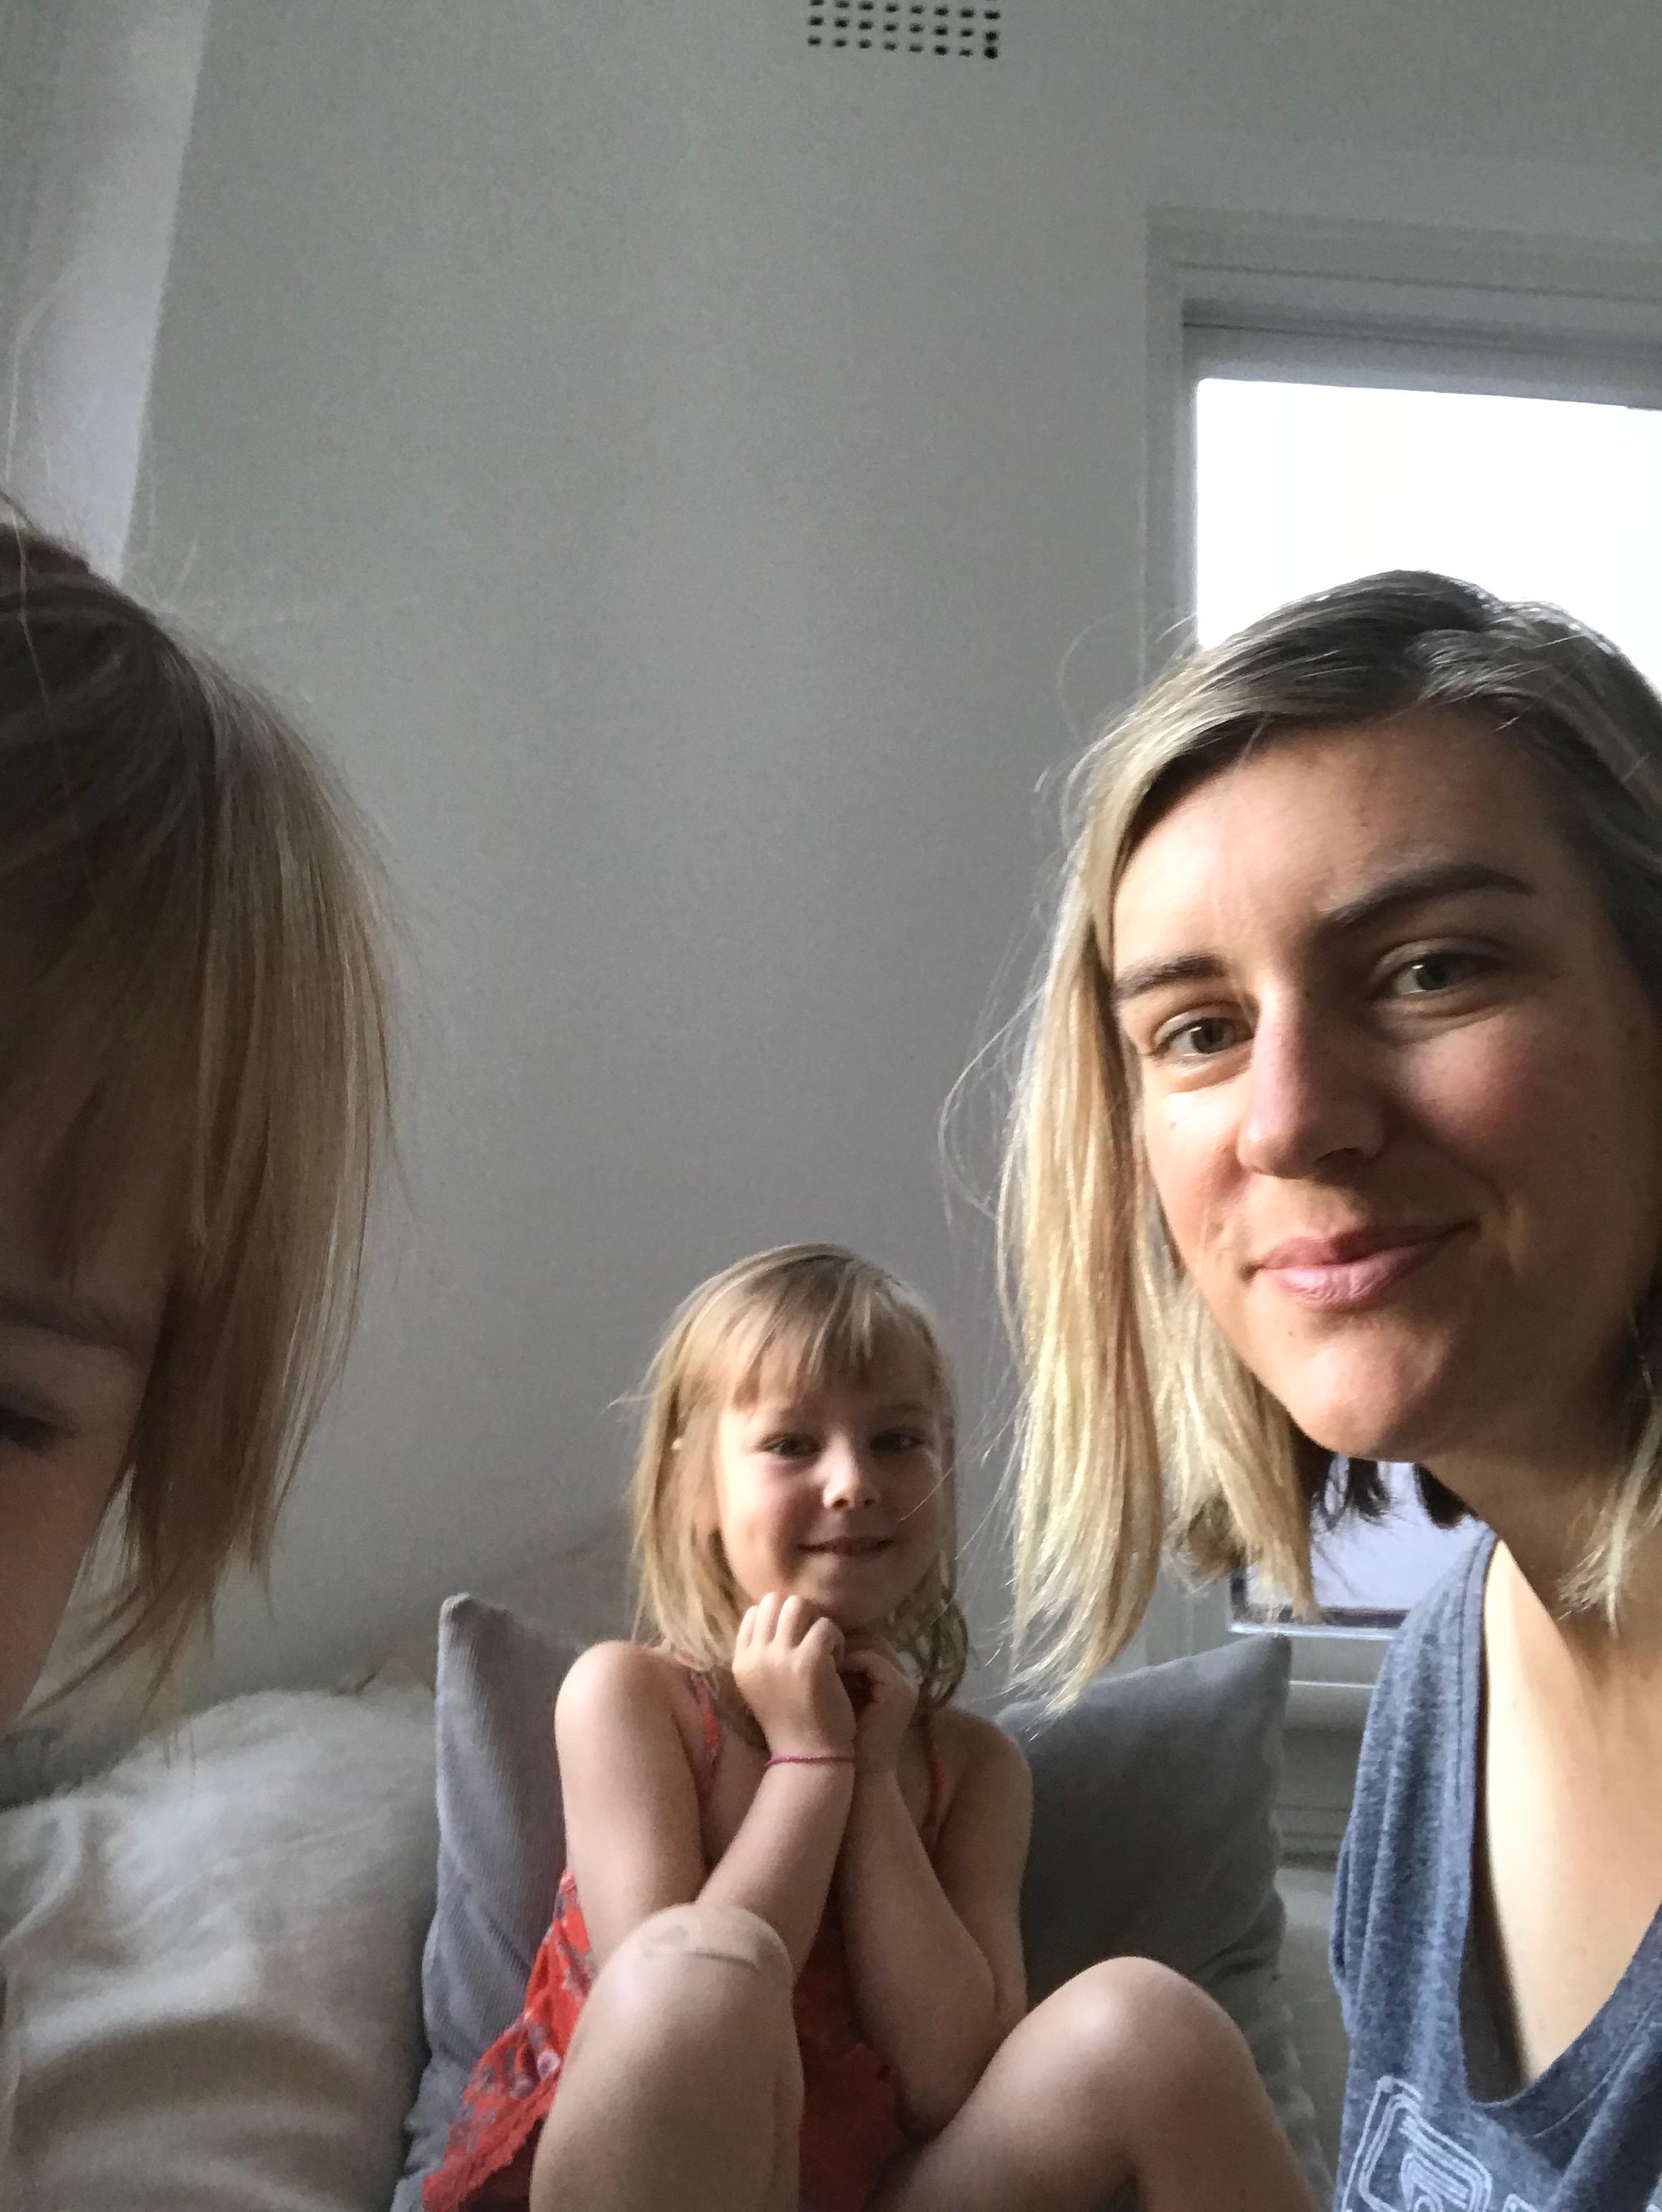 Feminest-nikki Ricks-and daughter.jpg